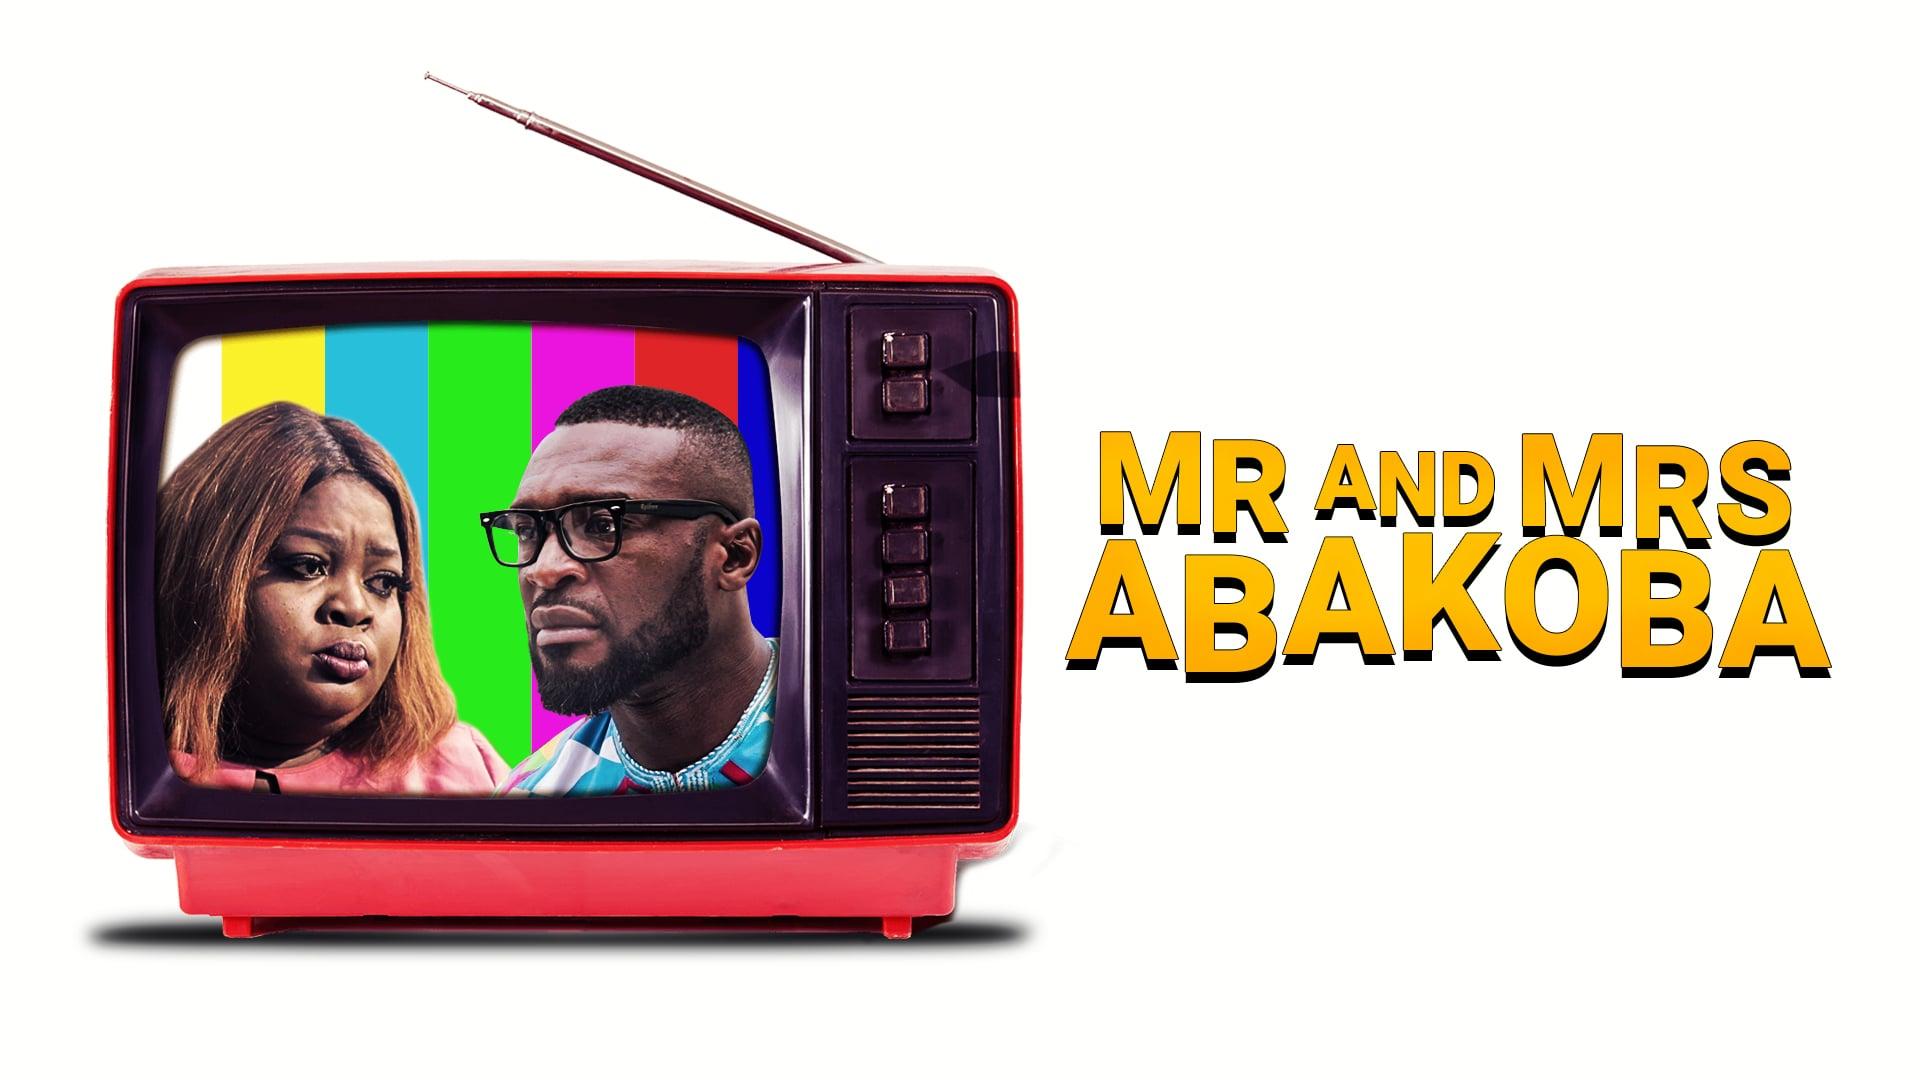 Mr And Mrs Abakoba